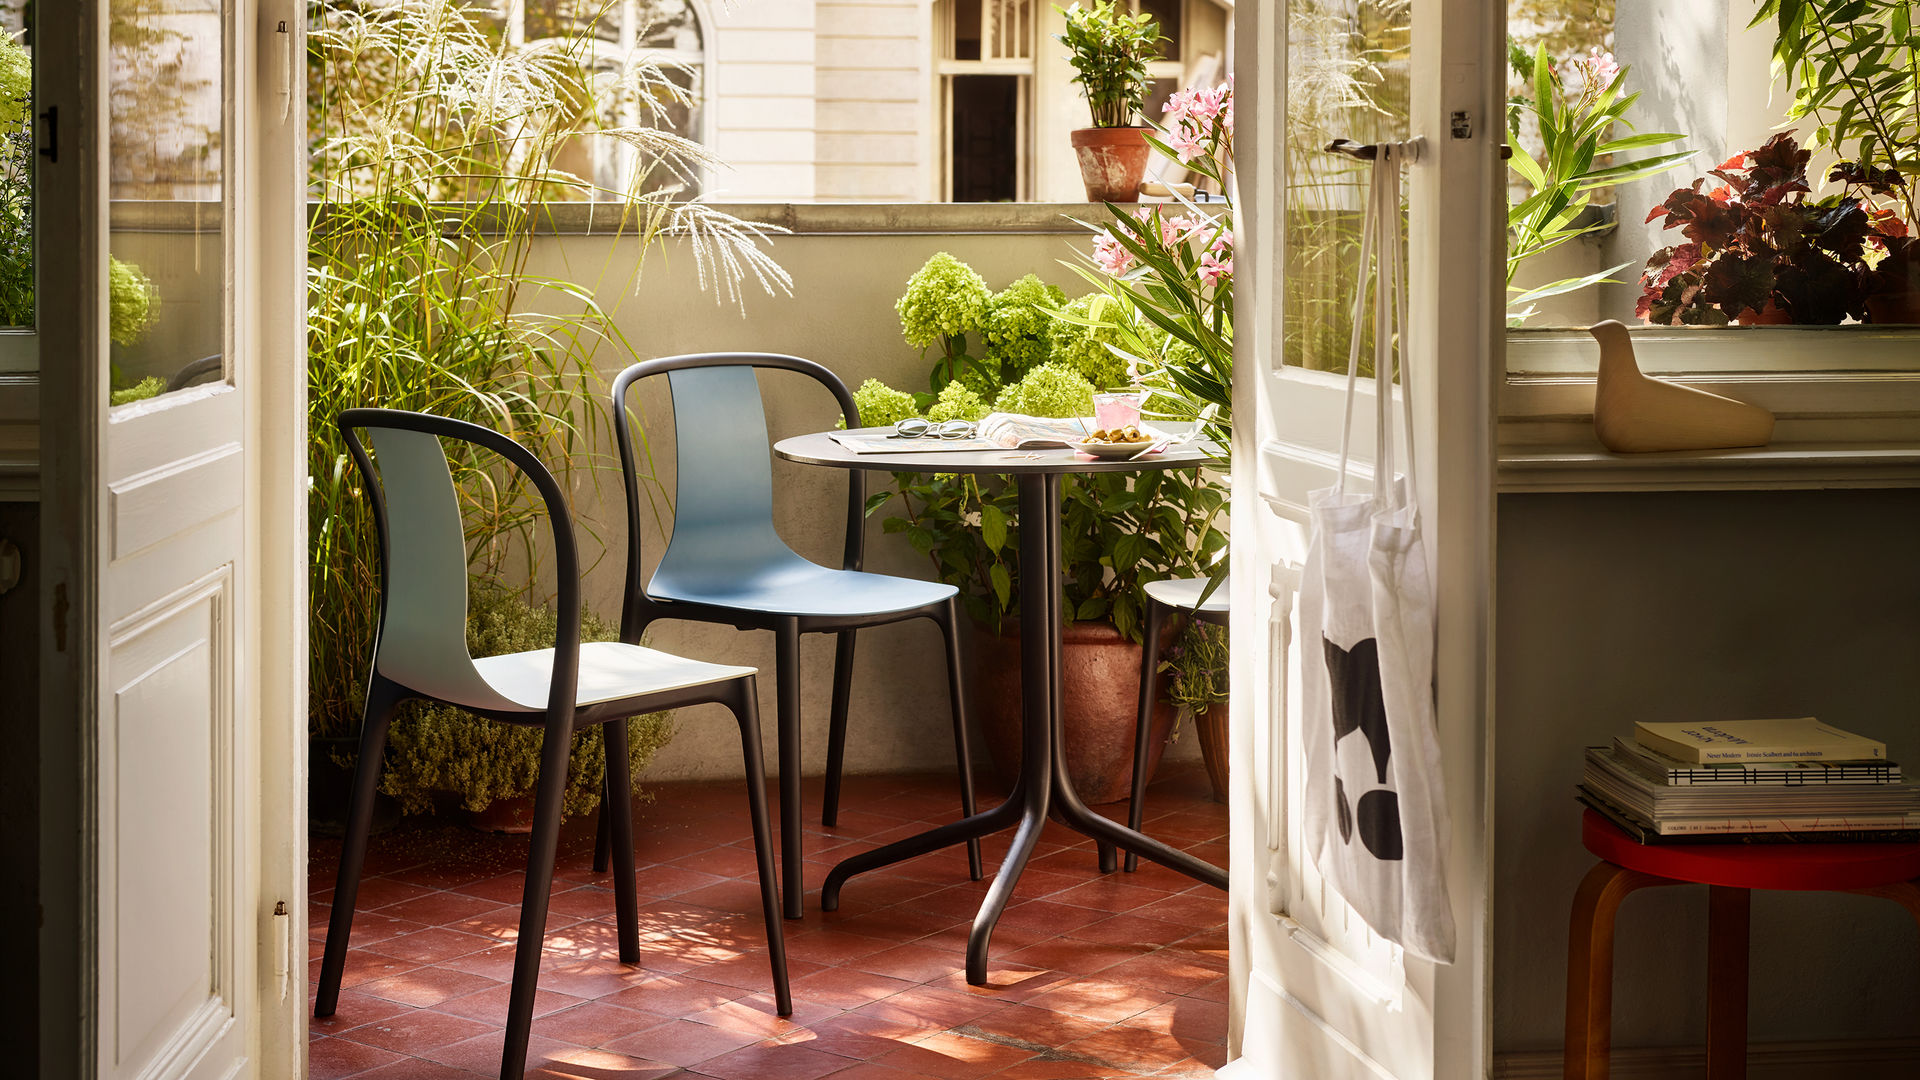 Belleville Chair Belleville Table outdoor_web_16-9